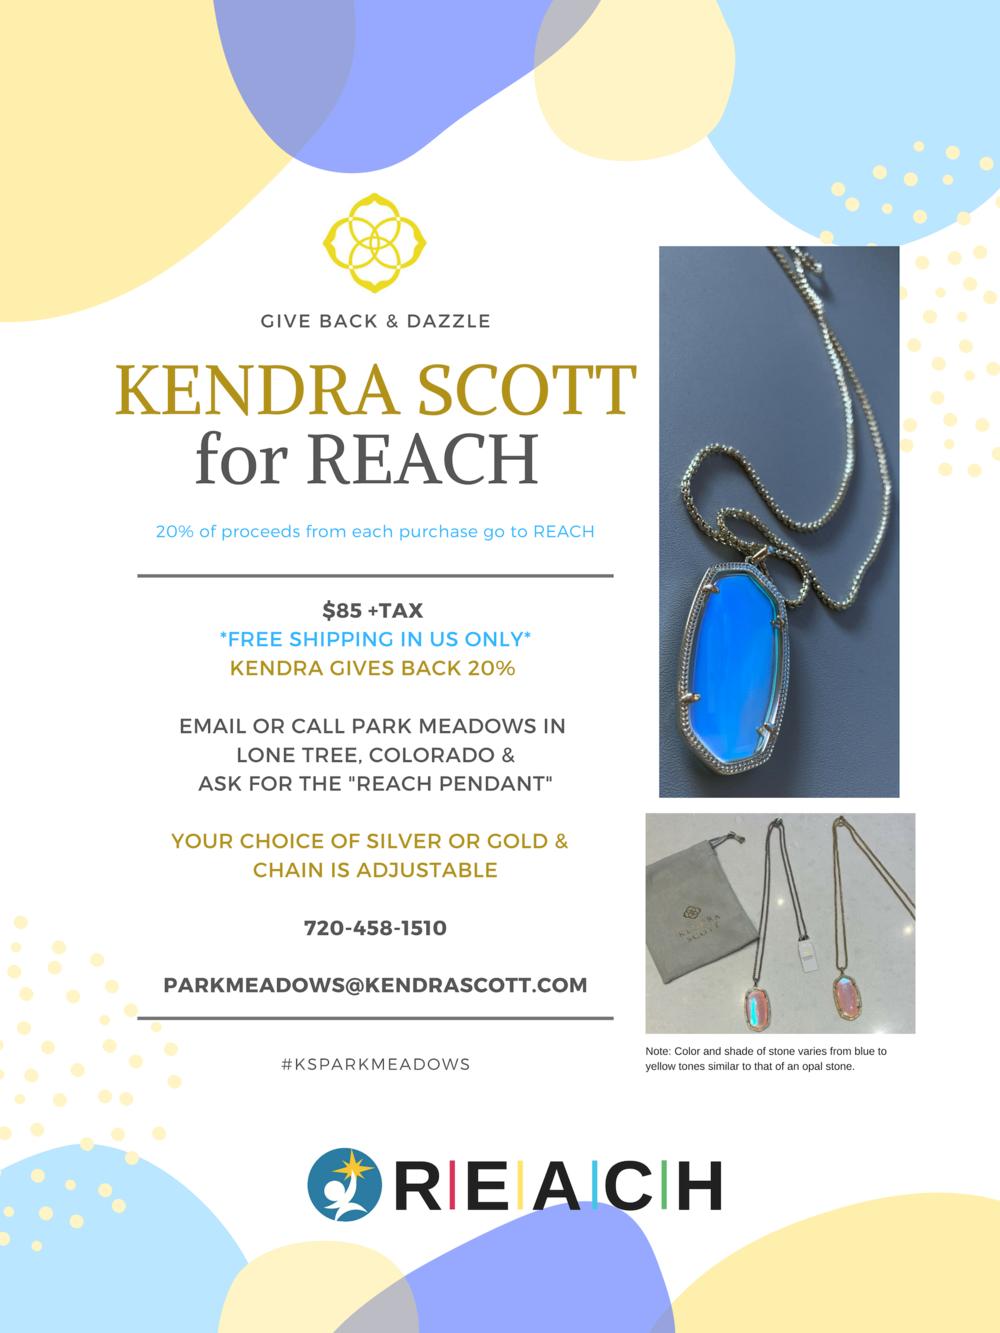 KendraScottForREACH2019.png